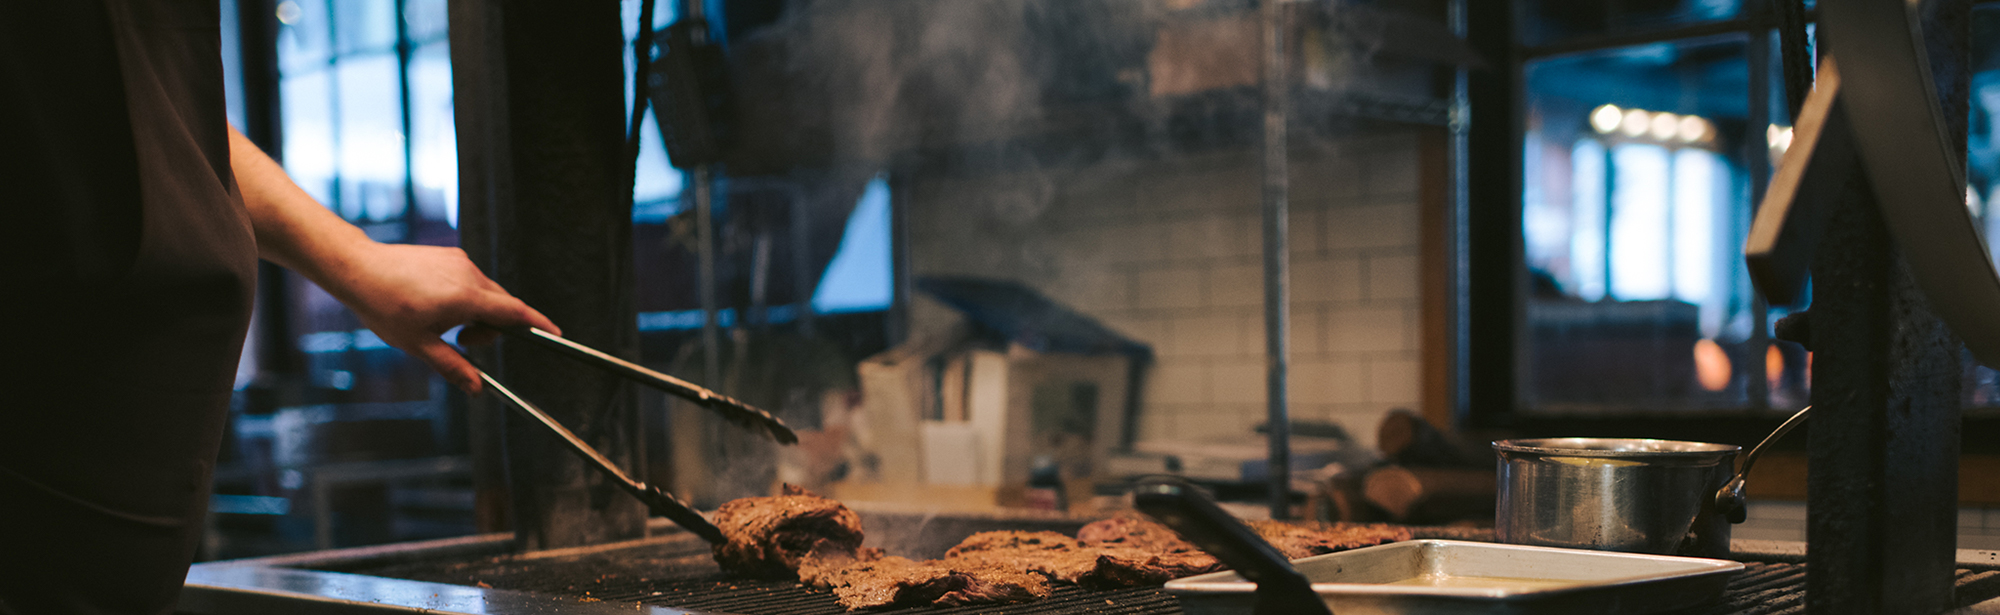 meat smoker